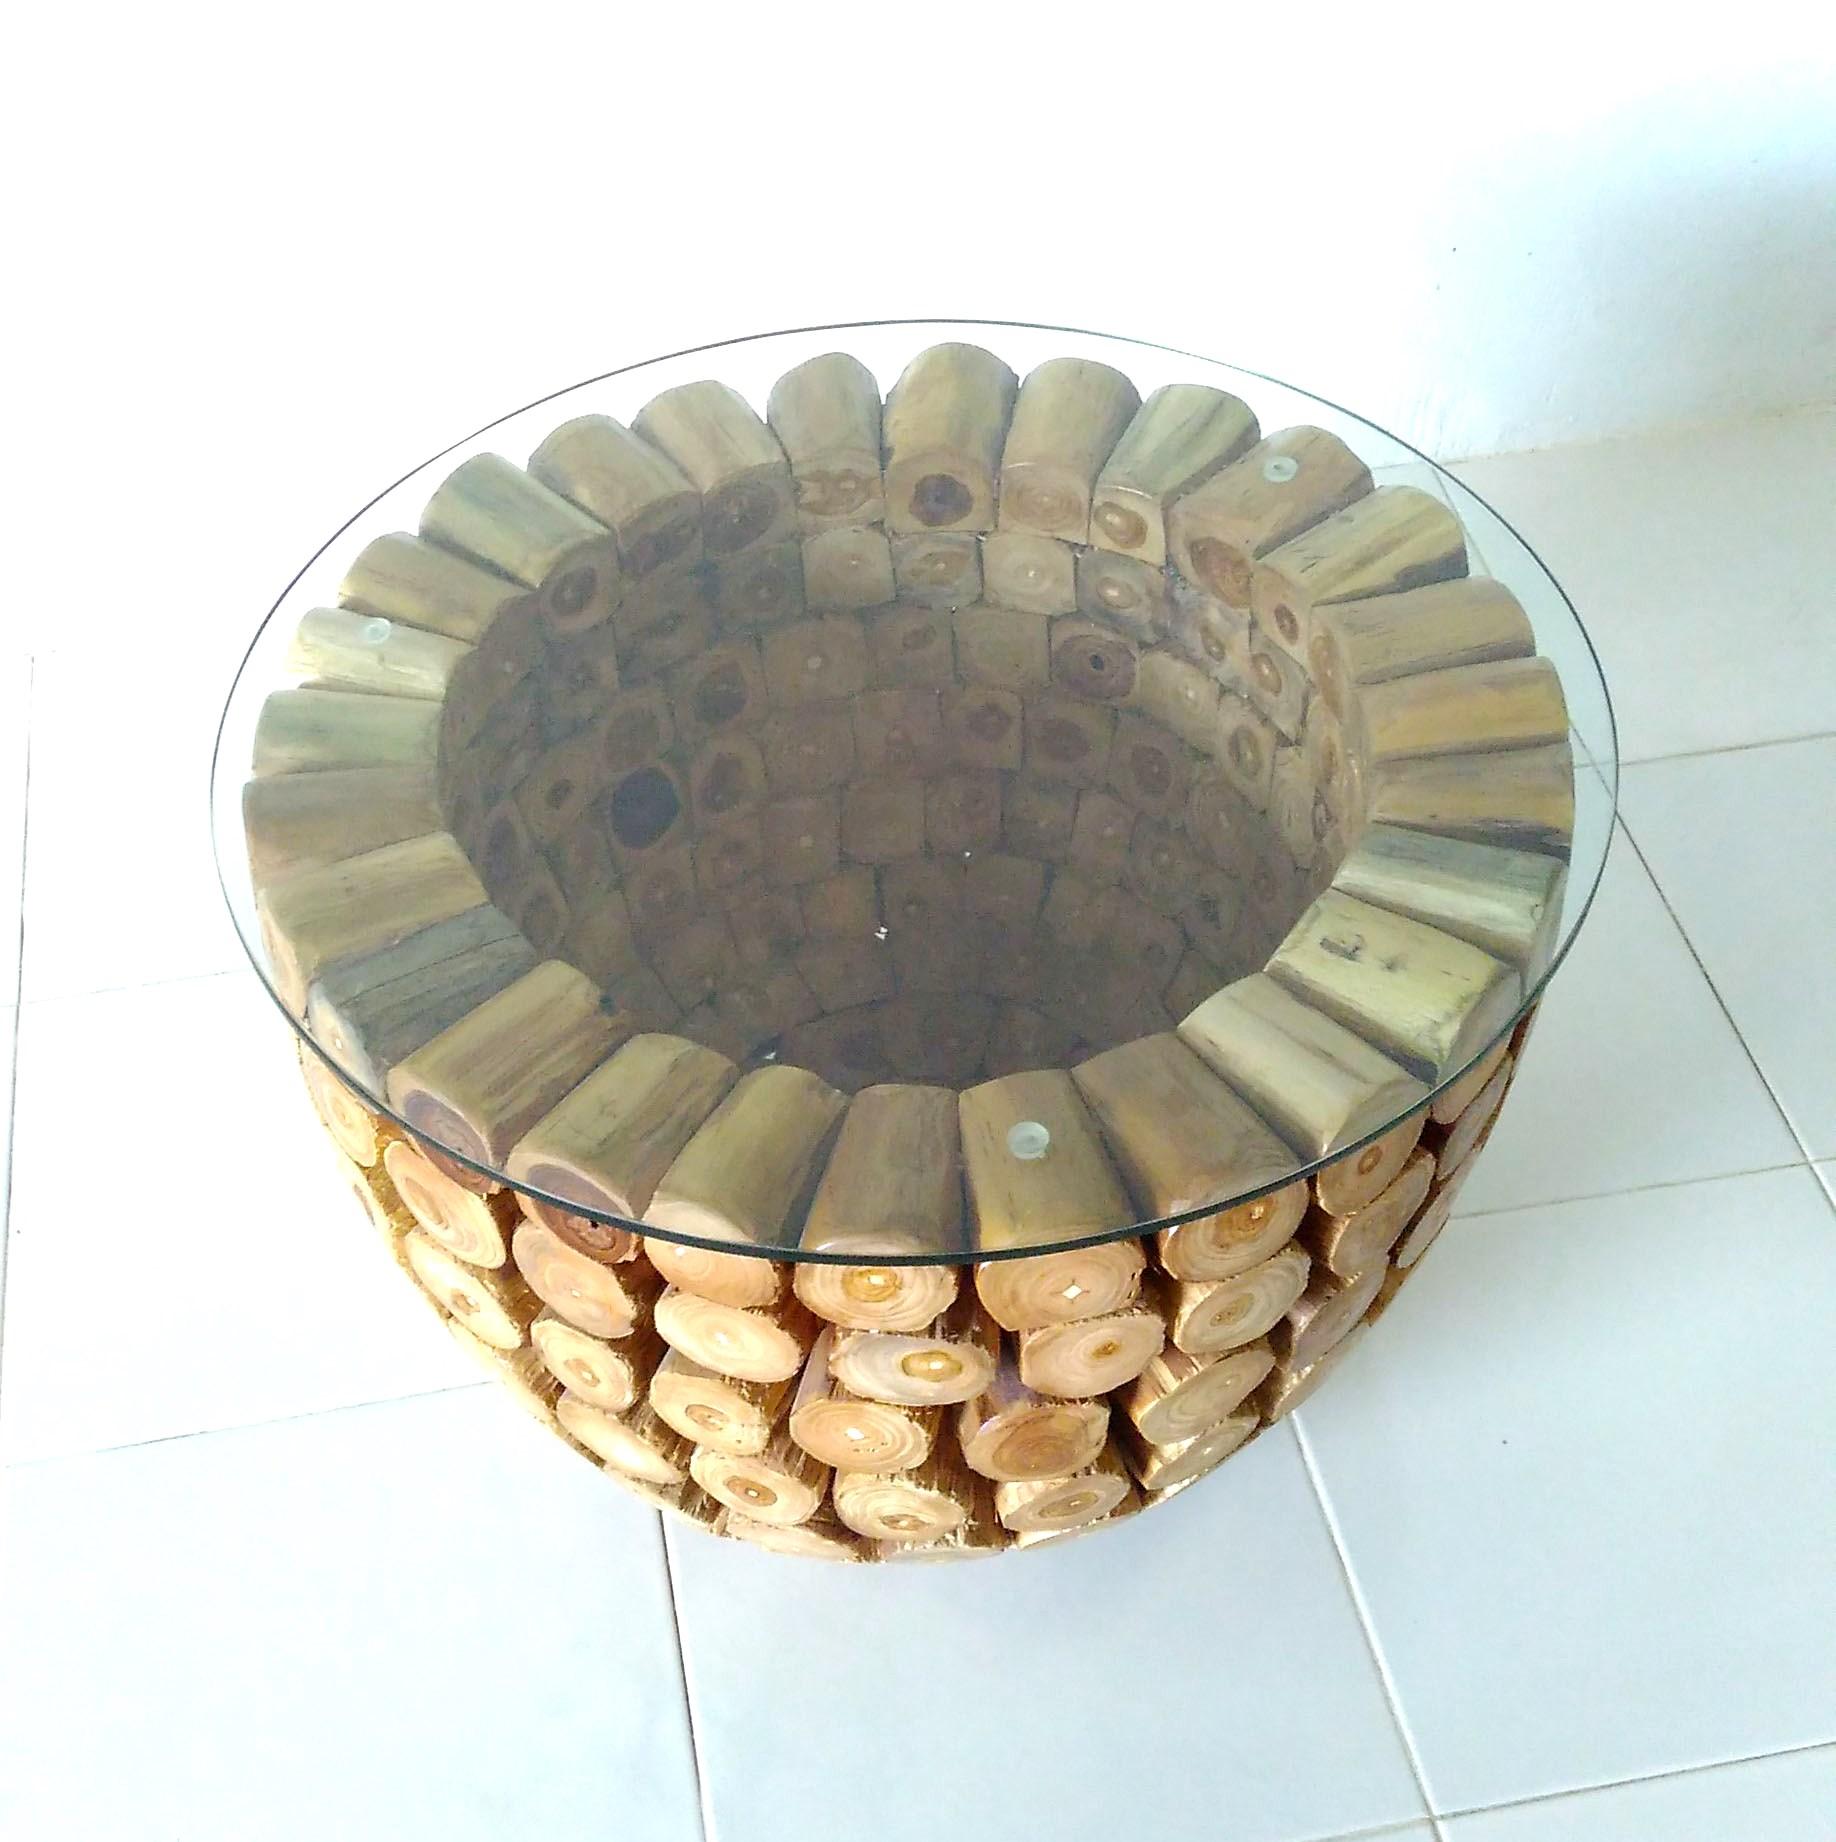 Teak Log Coffee Table With Glass Top